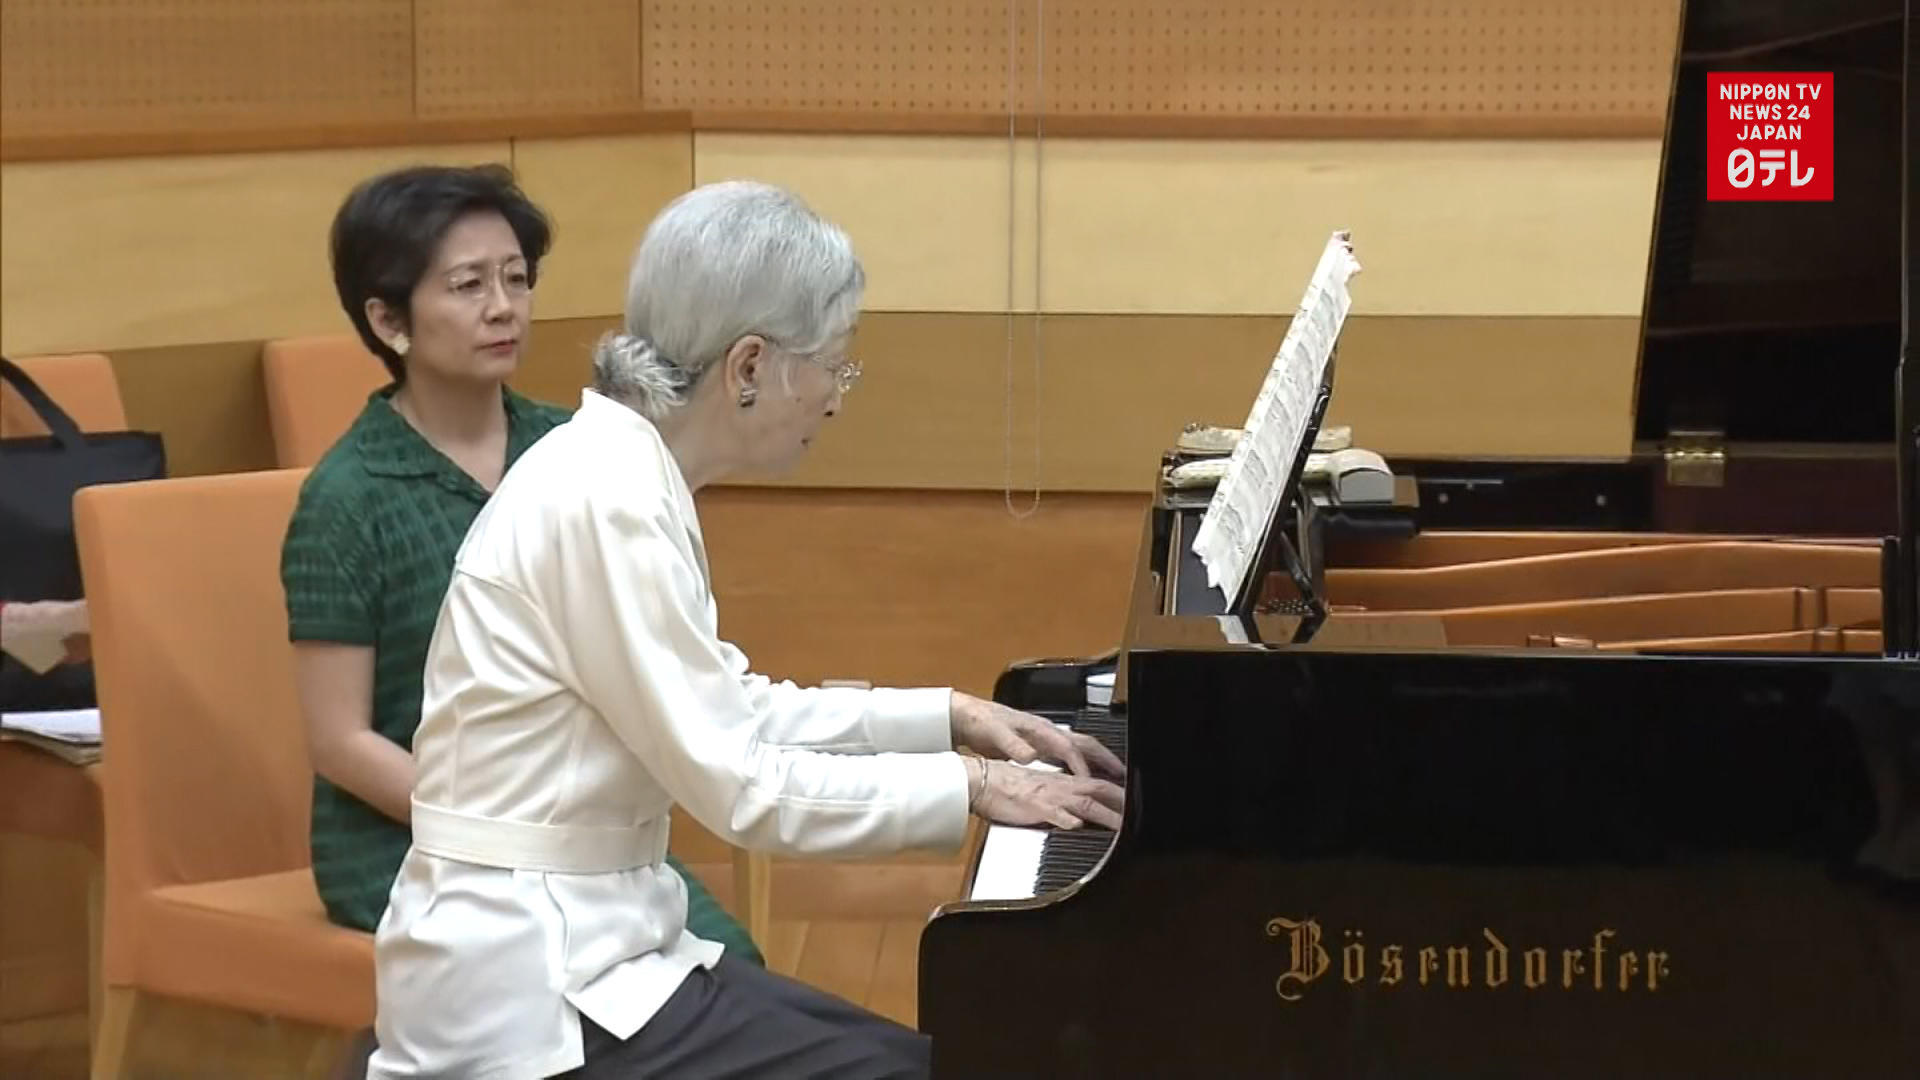 Empress Emerita plays the piano with Vienna Philharmonic flutist